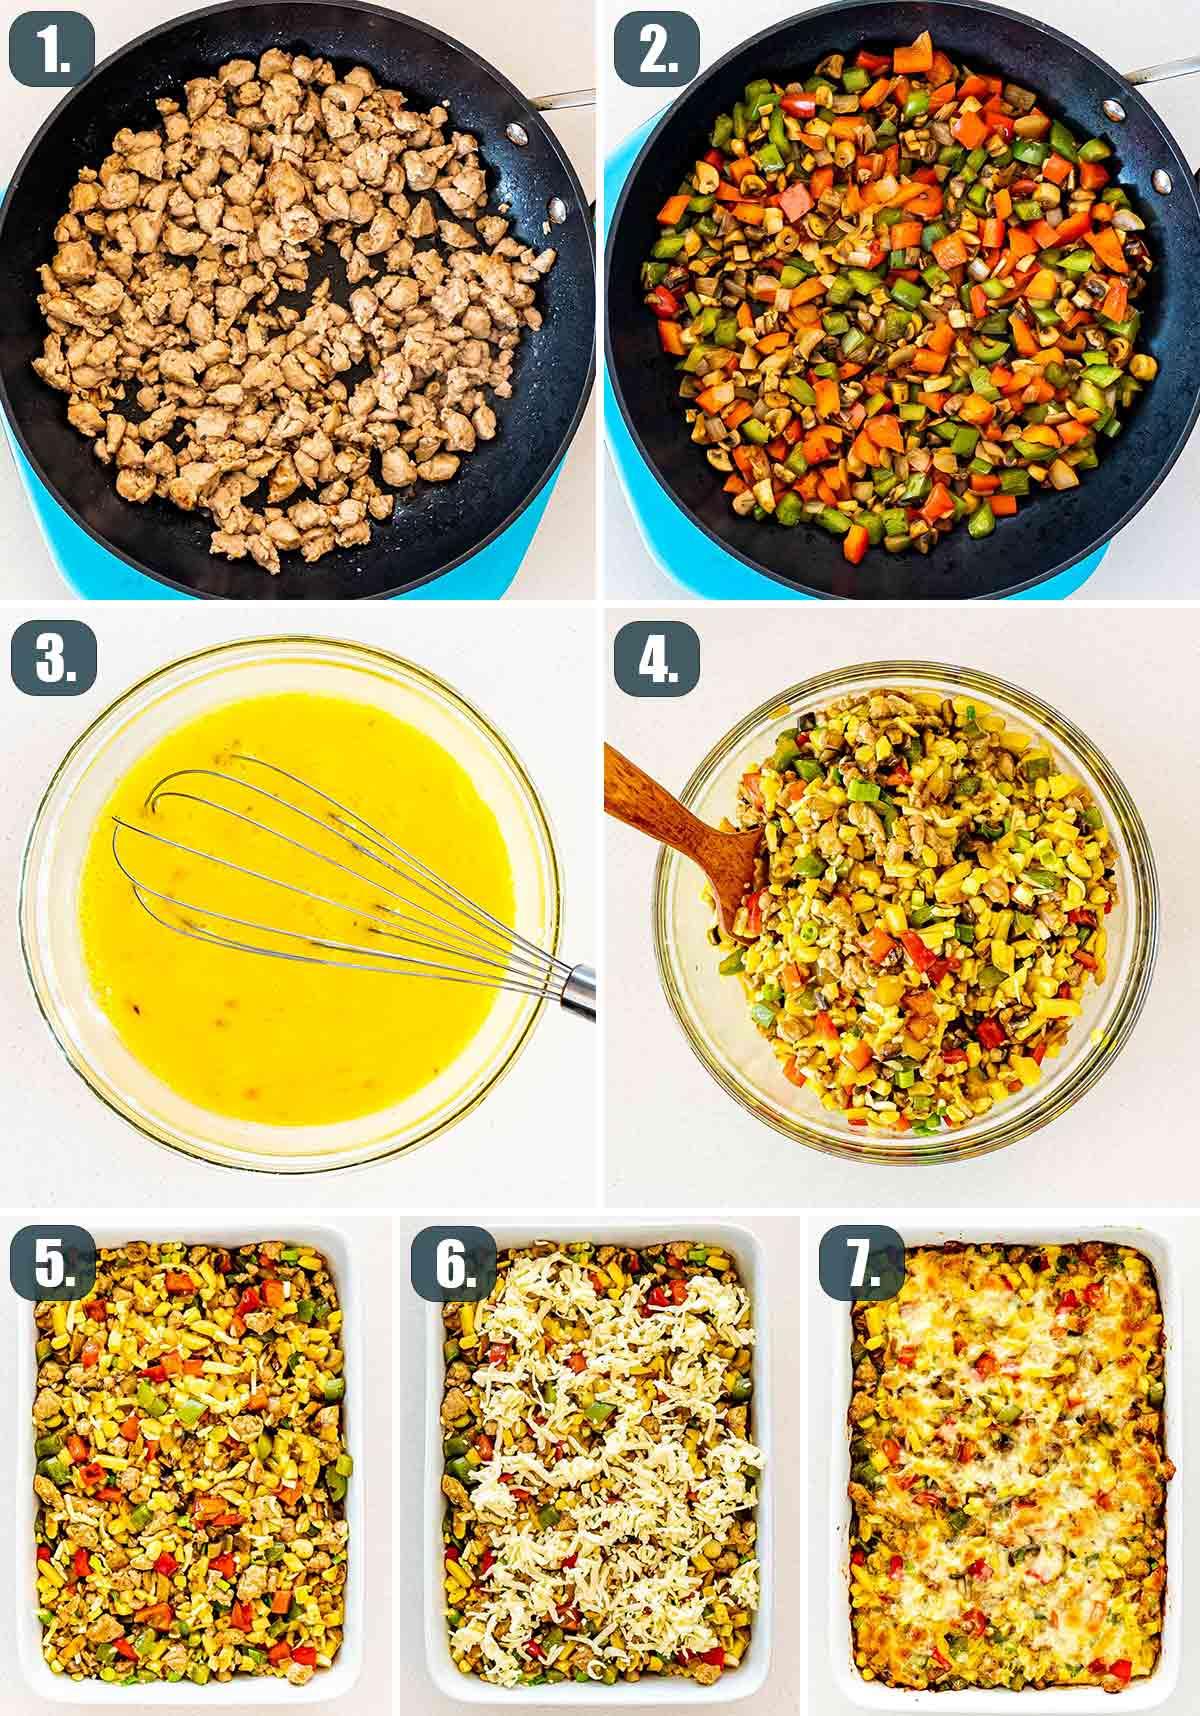 detailed process shots showing how to make sausage potato breakfast casserole.